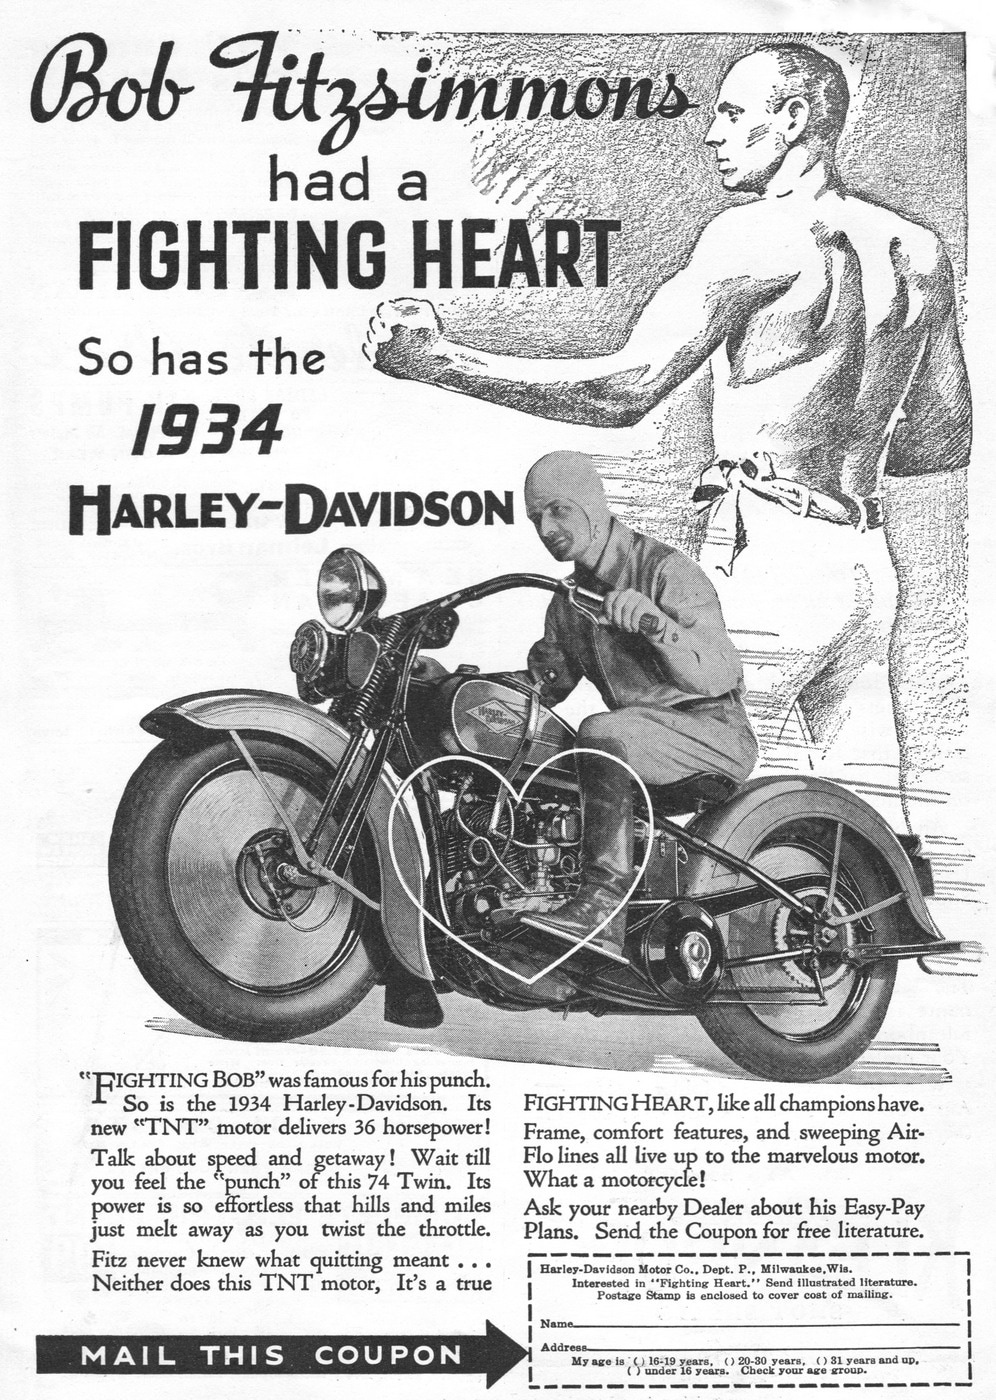 Harley-Davidson with Bob Fitzsimmons